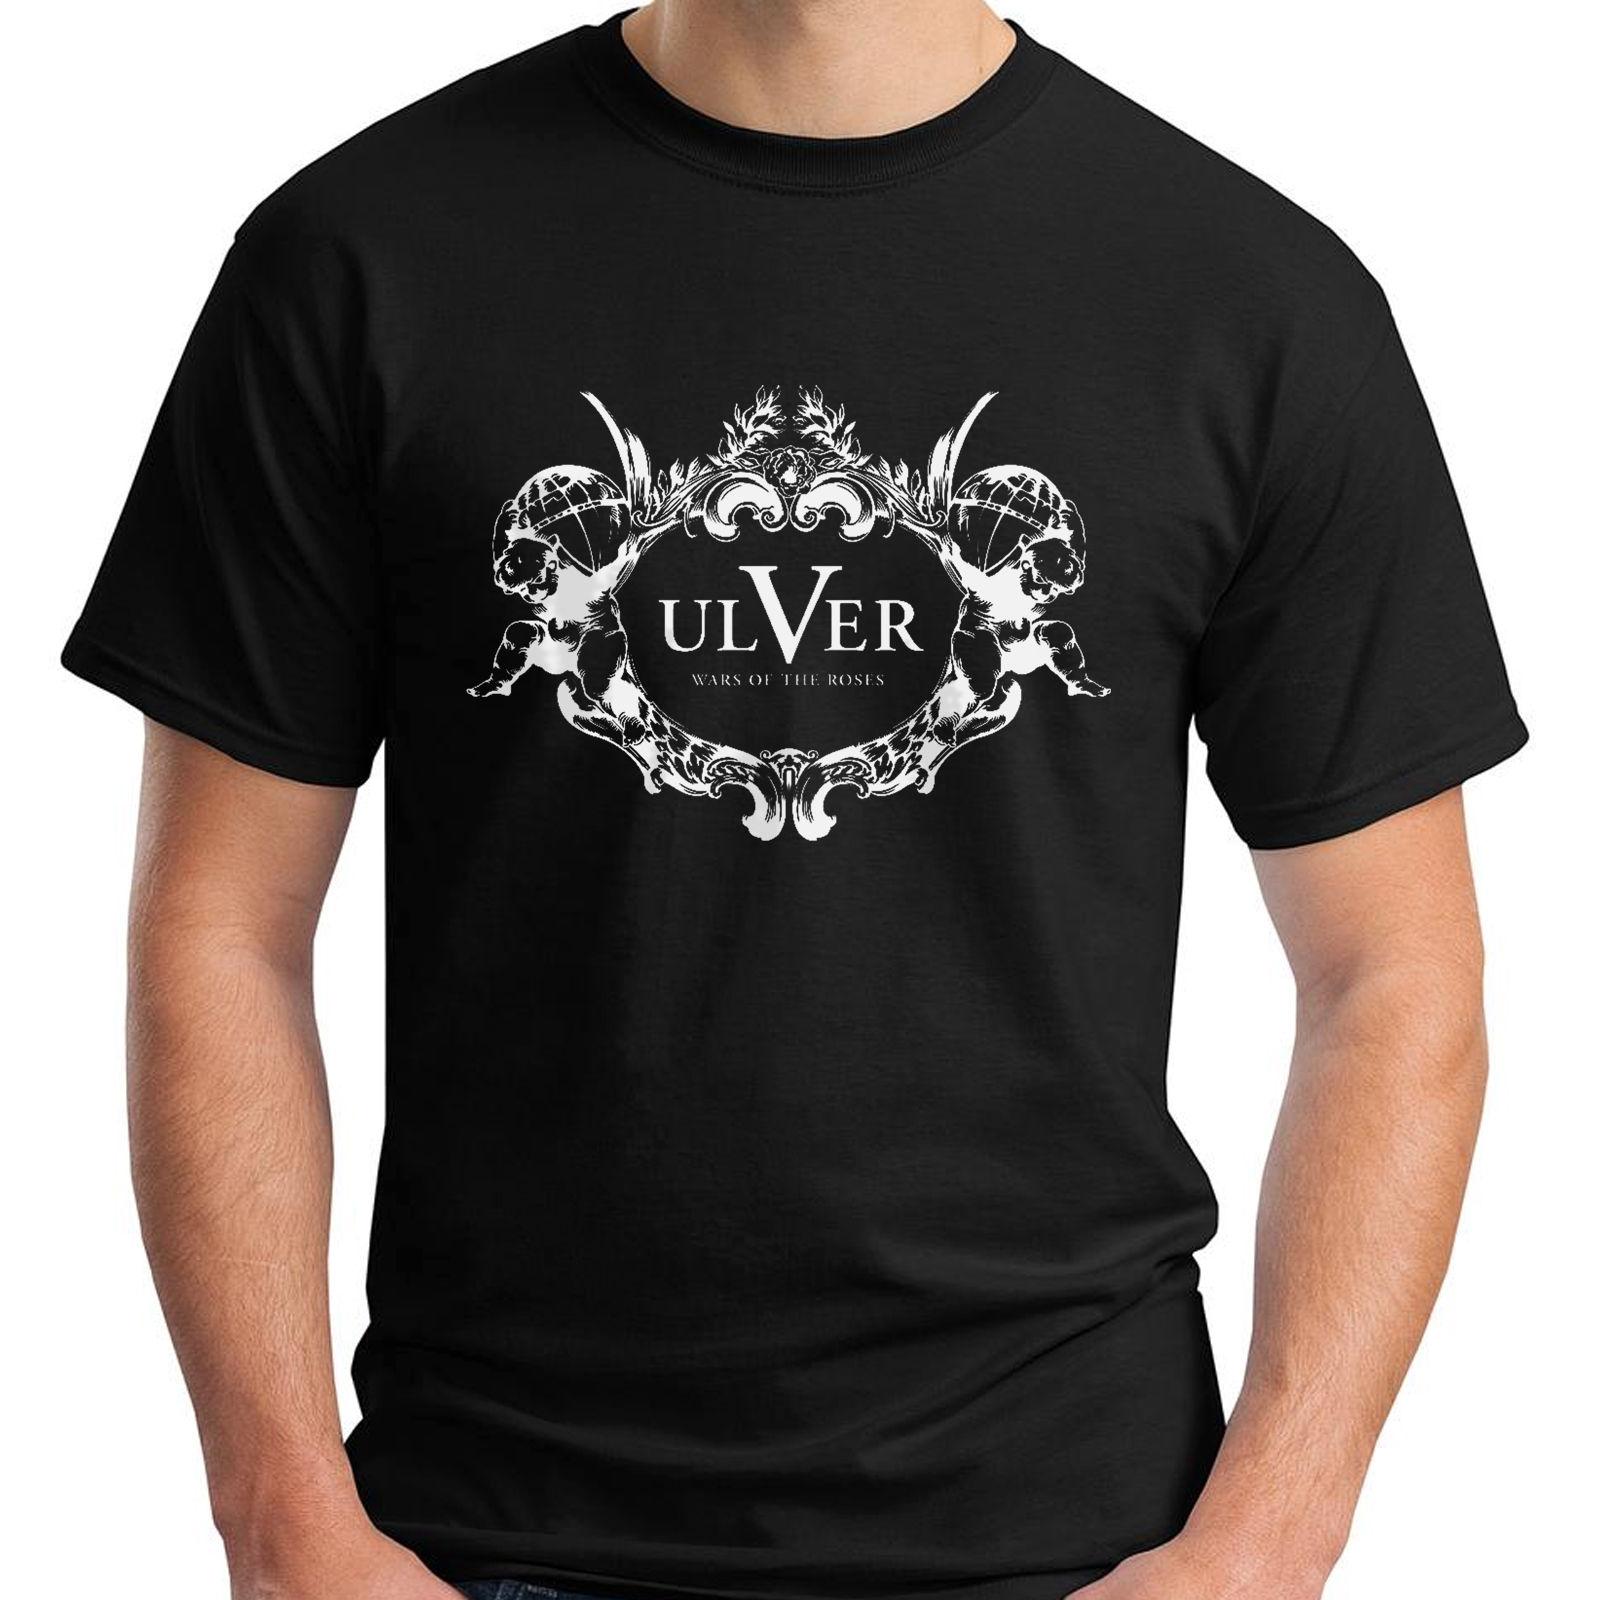 New ULVER Band Black Men's T-Shirt Size S-3XLMENS T-SHIRT Printed